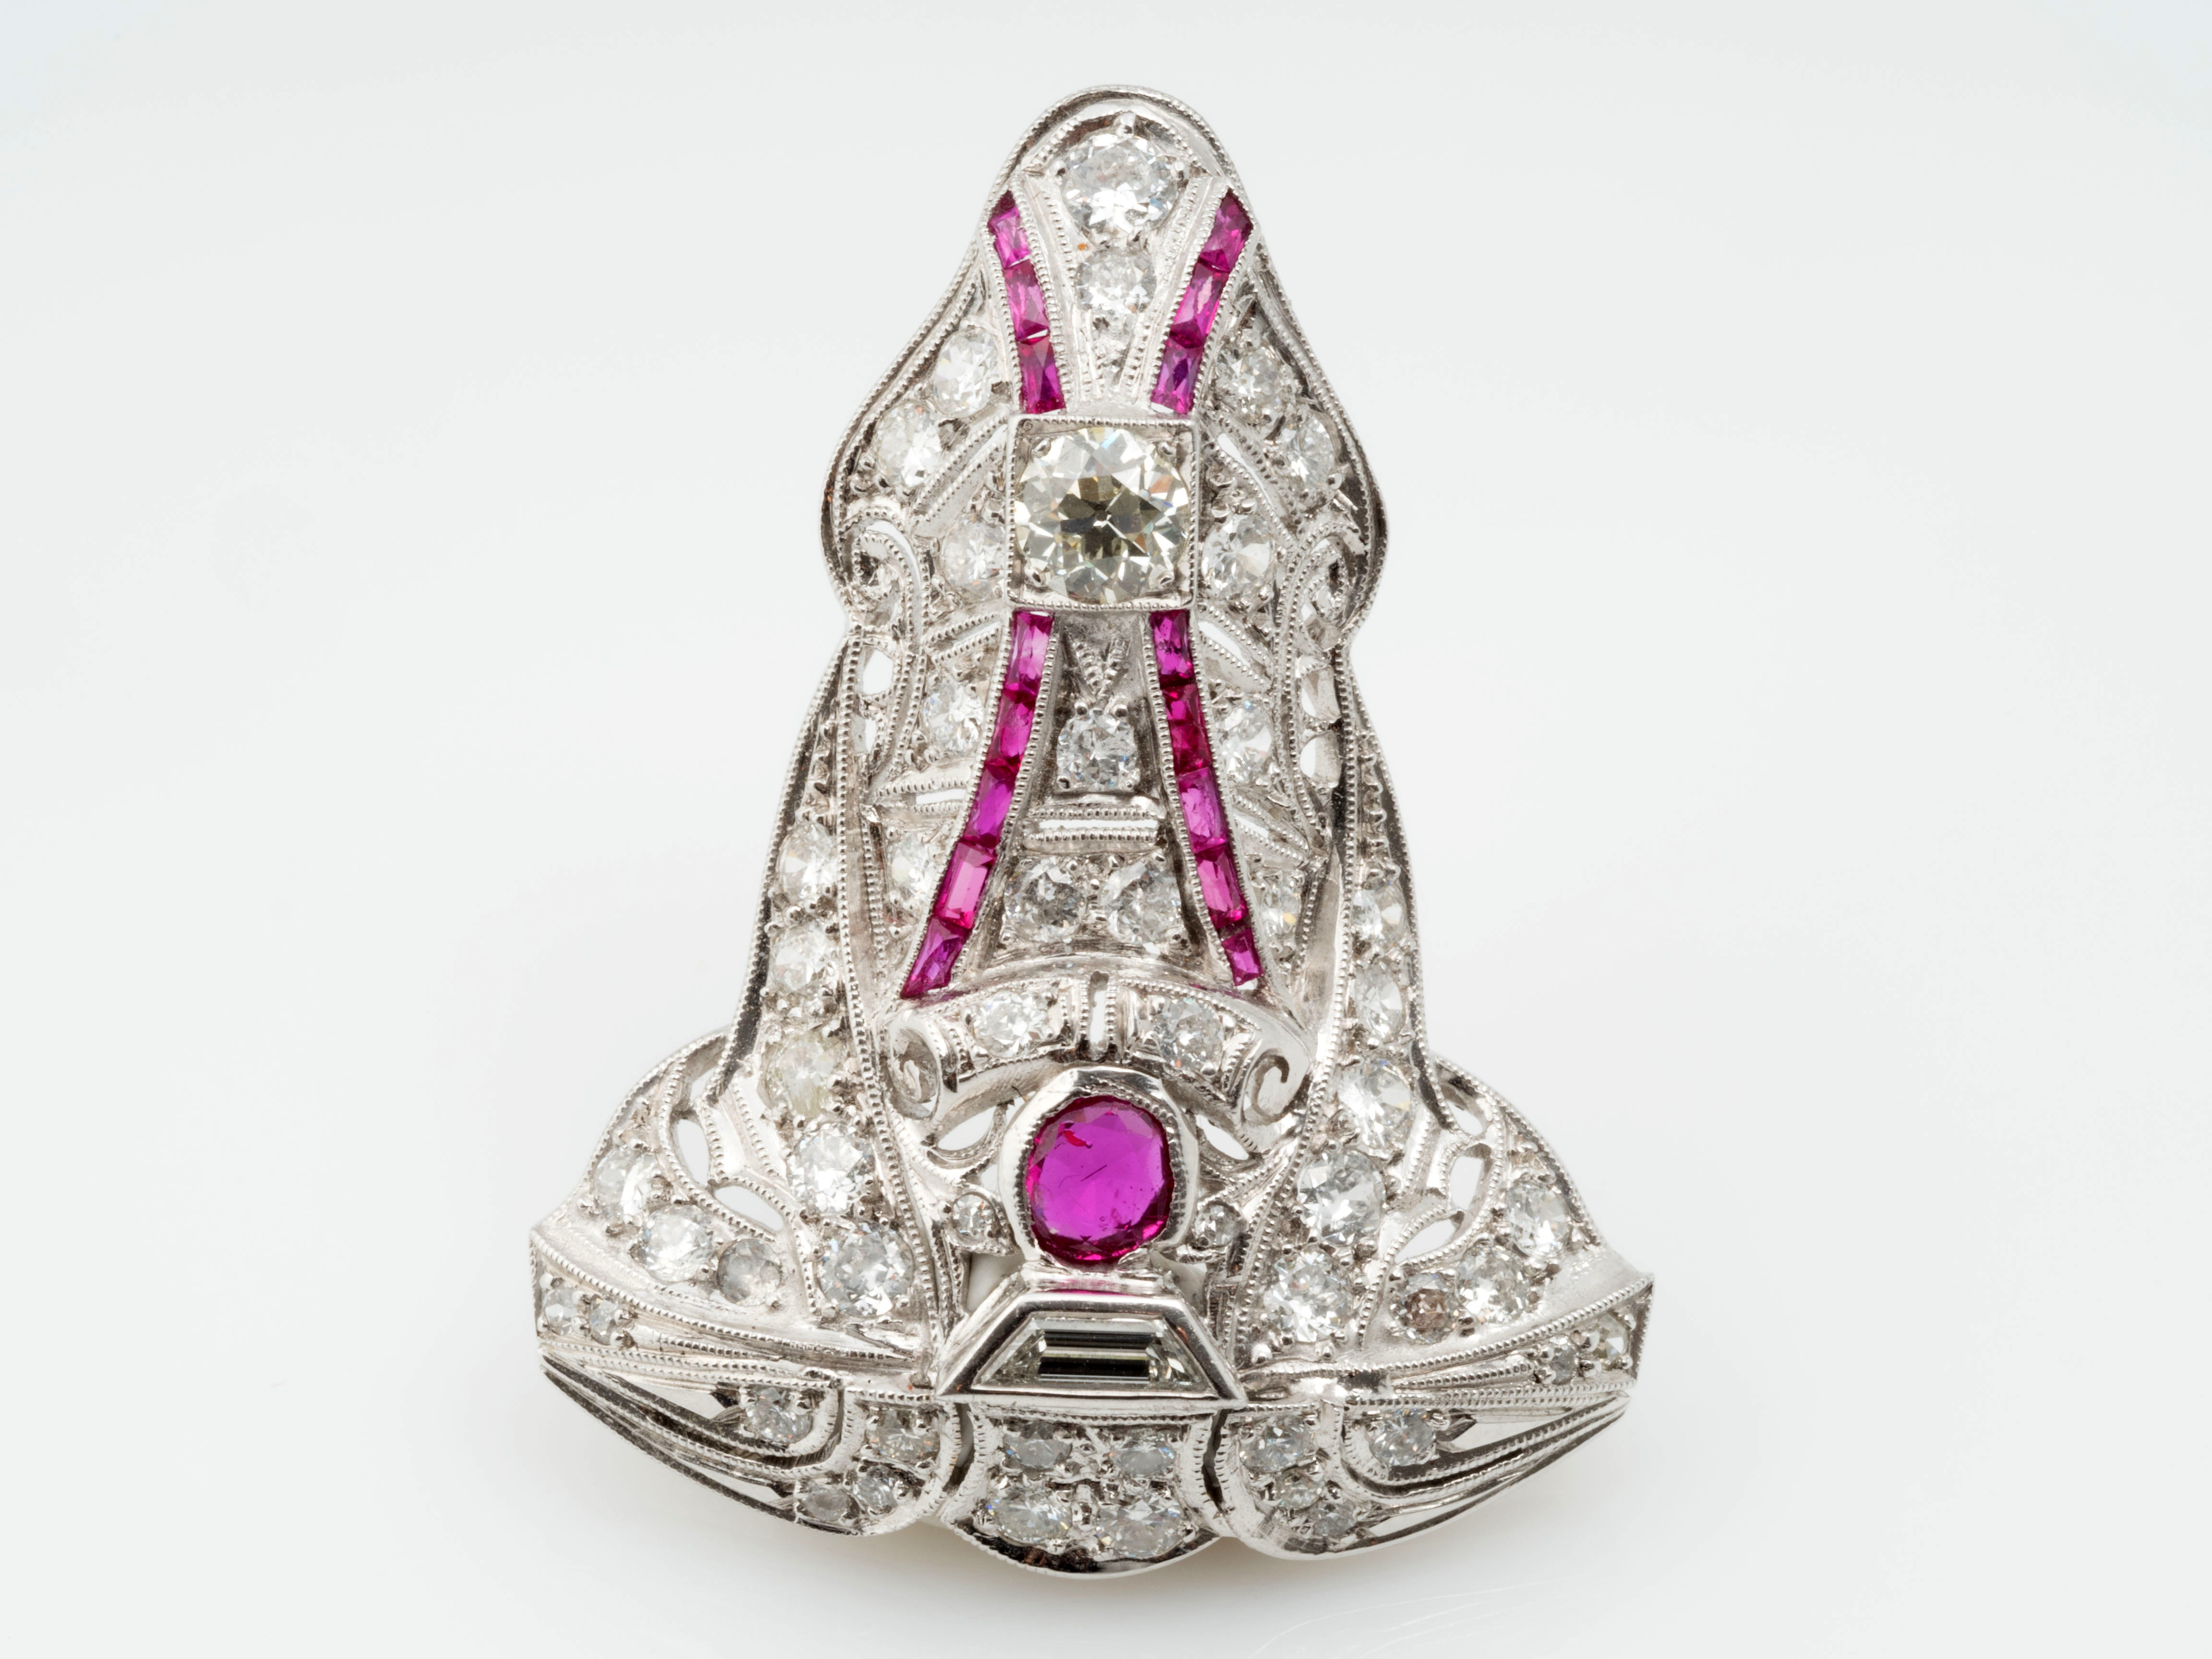 antiker anh nger 2 00 karat diamanten 1 00 karat rubine 750 platin um 1920 ebay. Black Bedroom Furniture Sets. Home Design Ideas